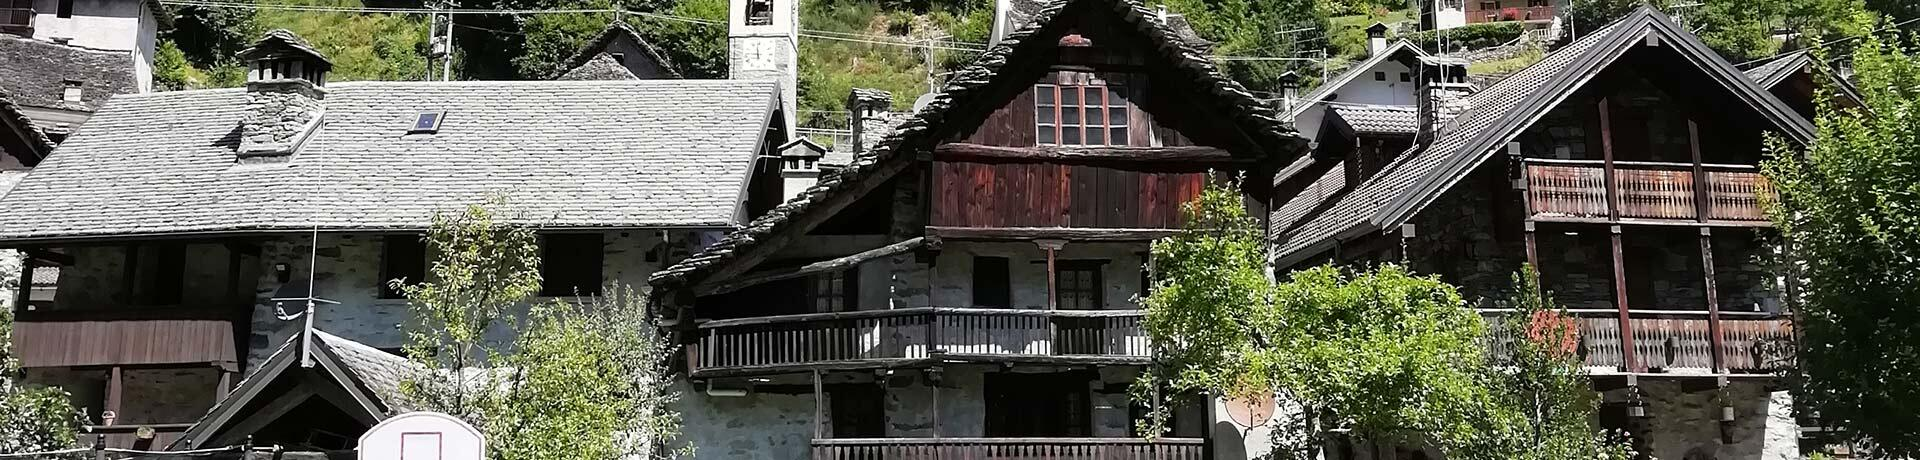 residencecimajazzi de chalet-borgone-monte-rosa 008